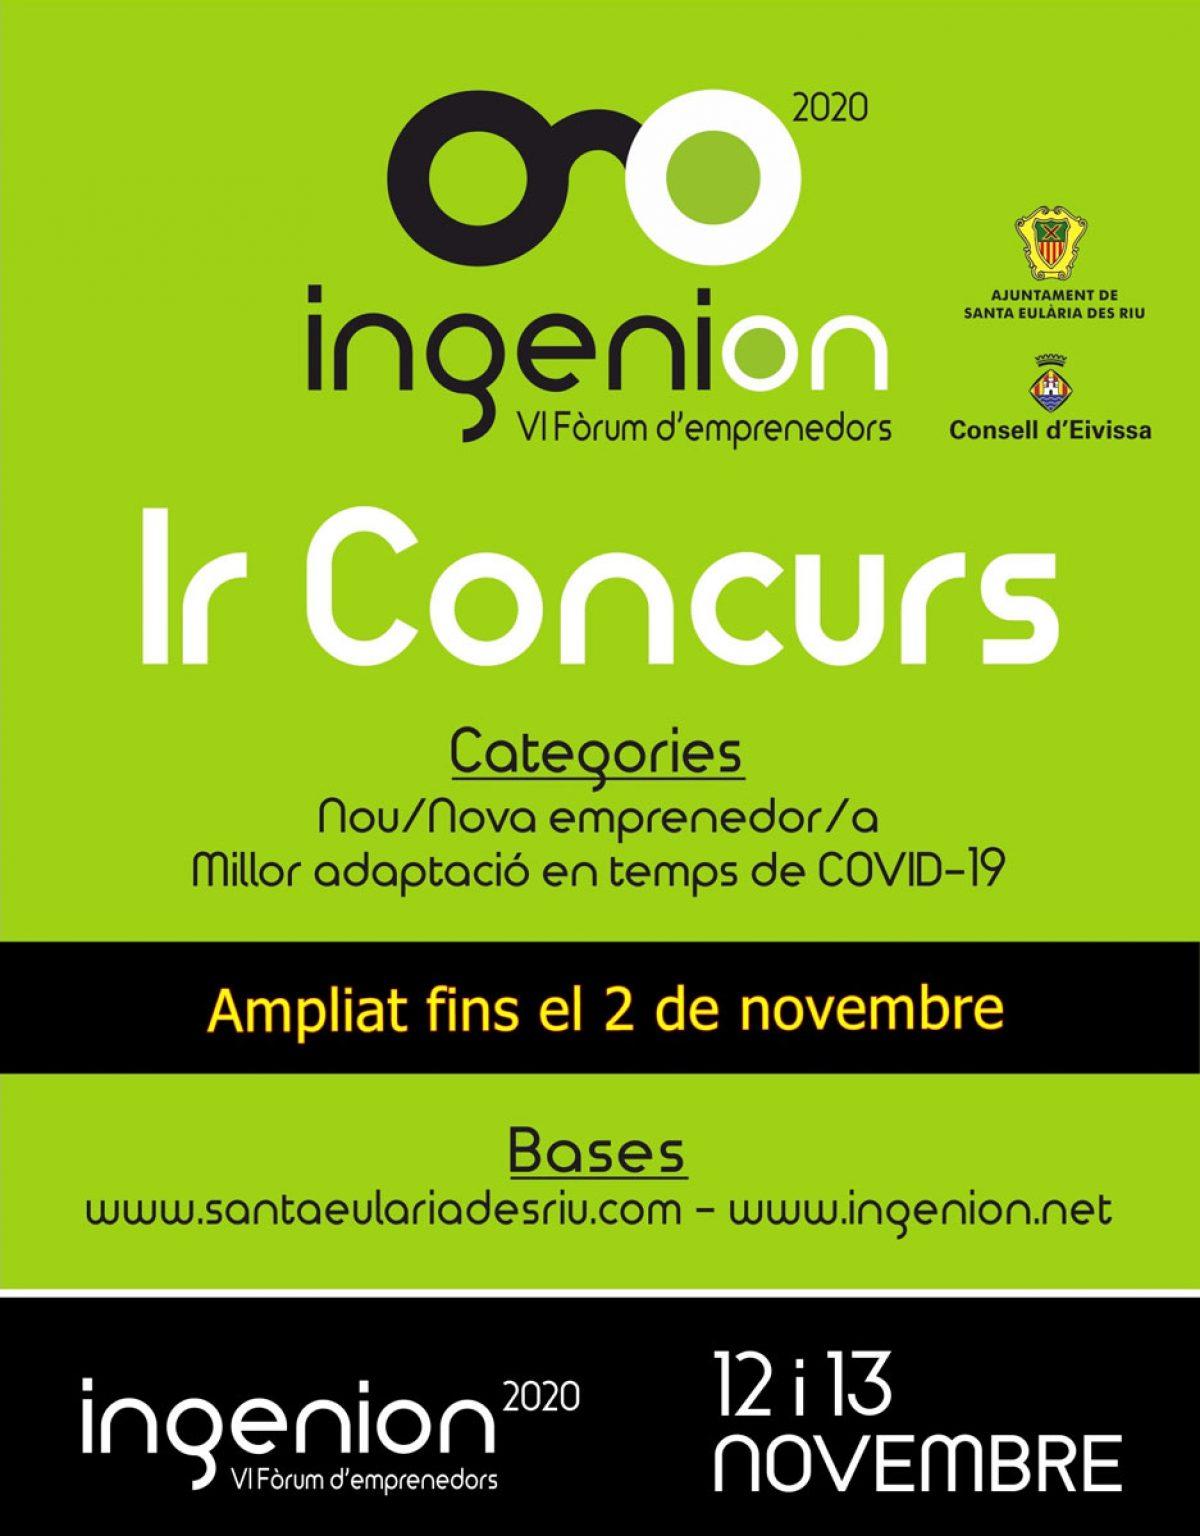 i-concurso-ingenion-santa-eulalia-ibiza-2020-welcometoibiza